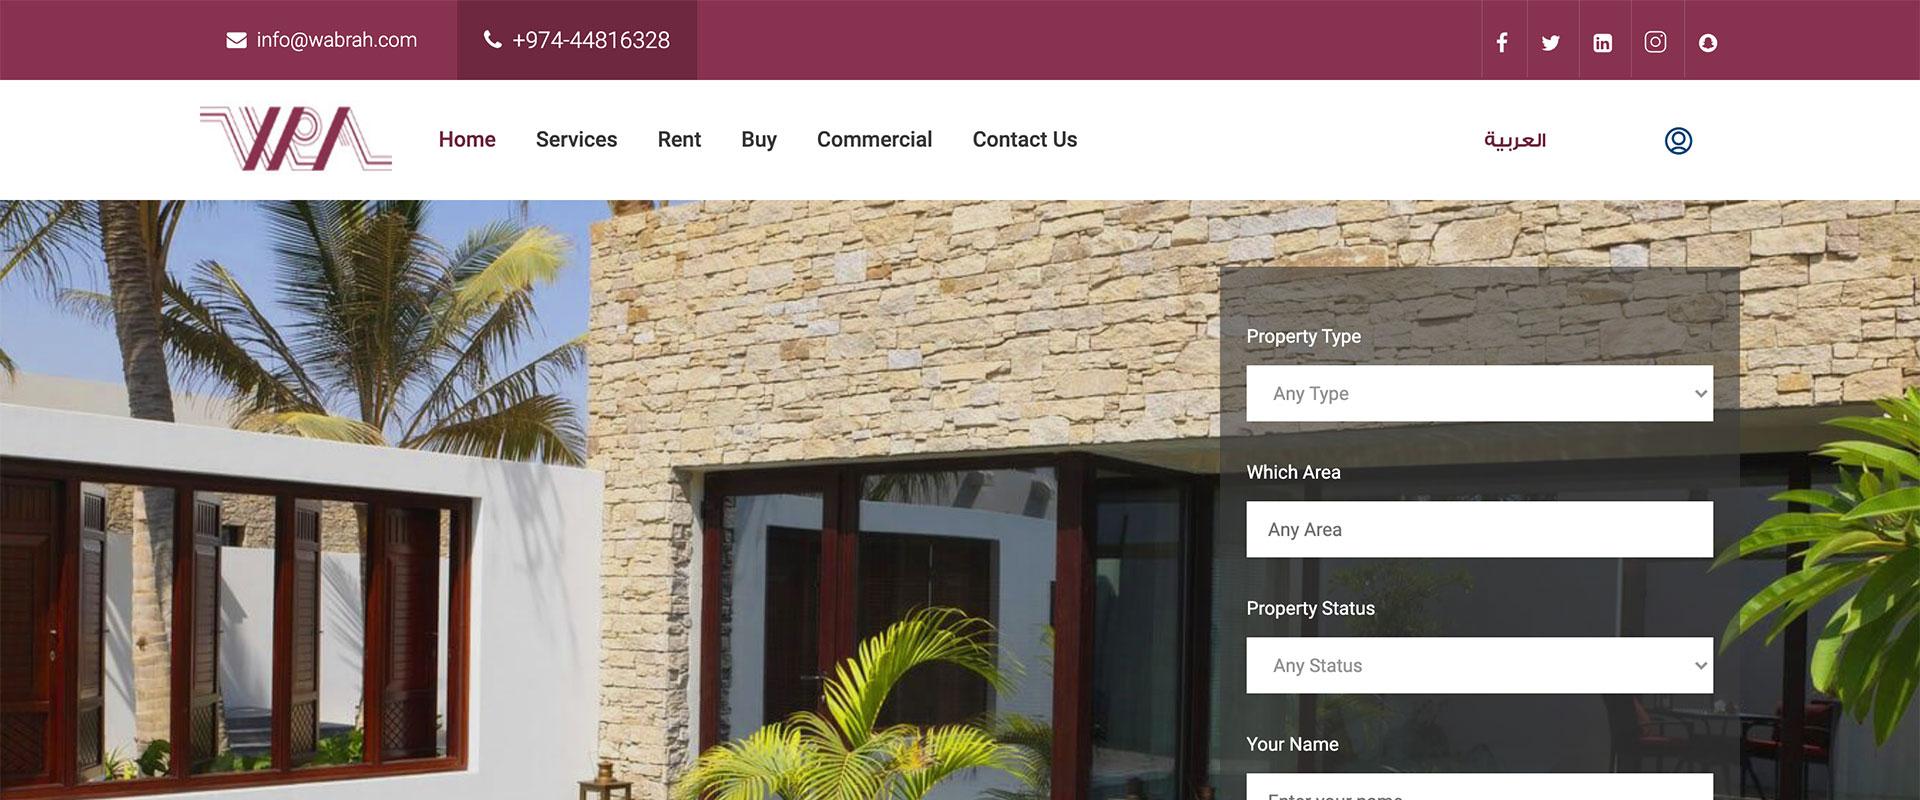 Wabrah Real Estate Qatar